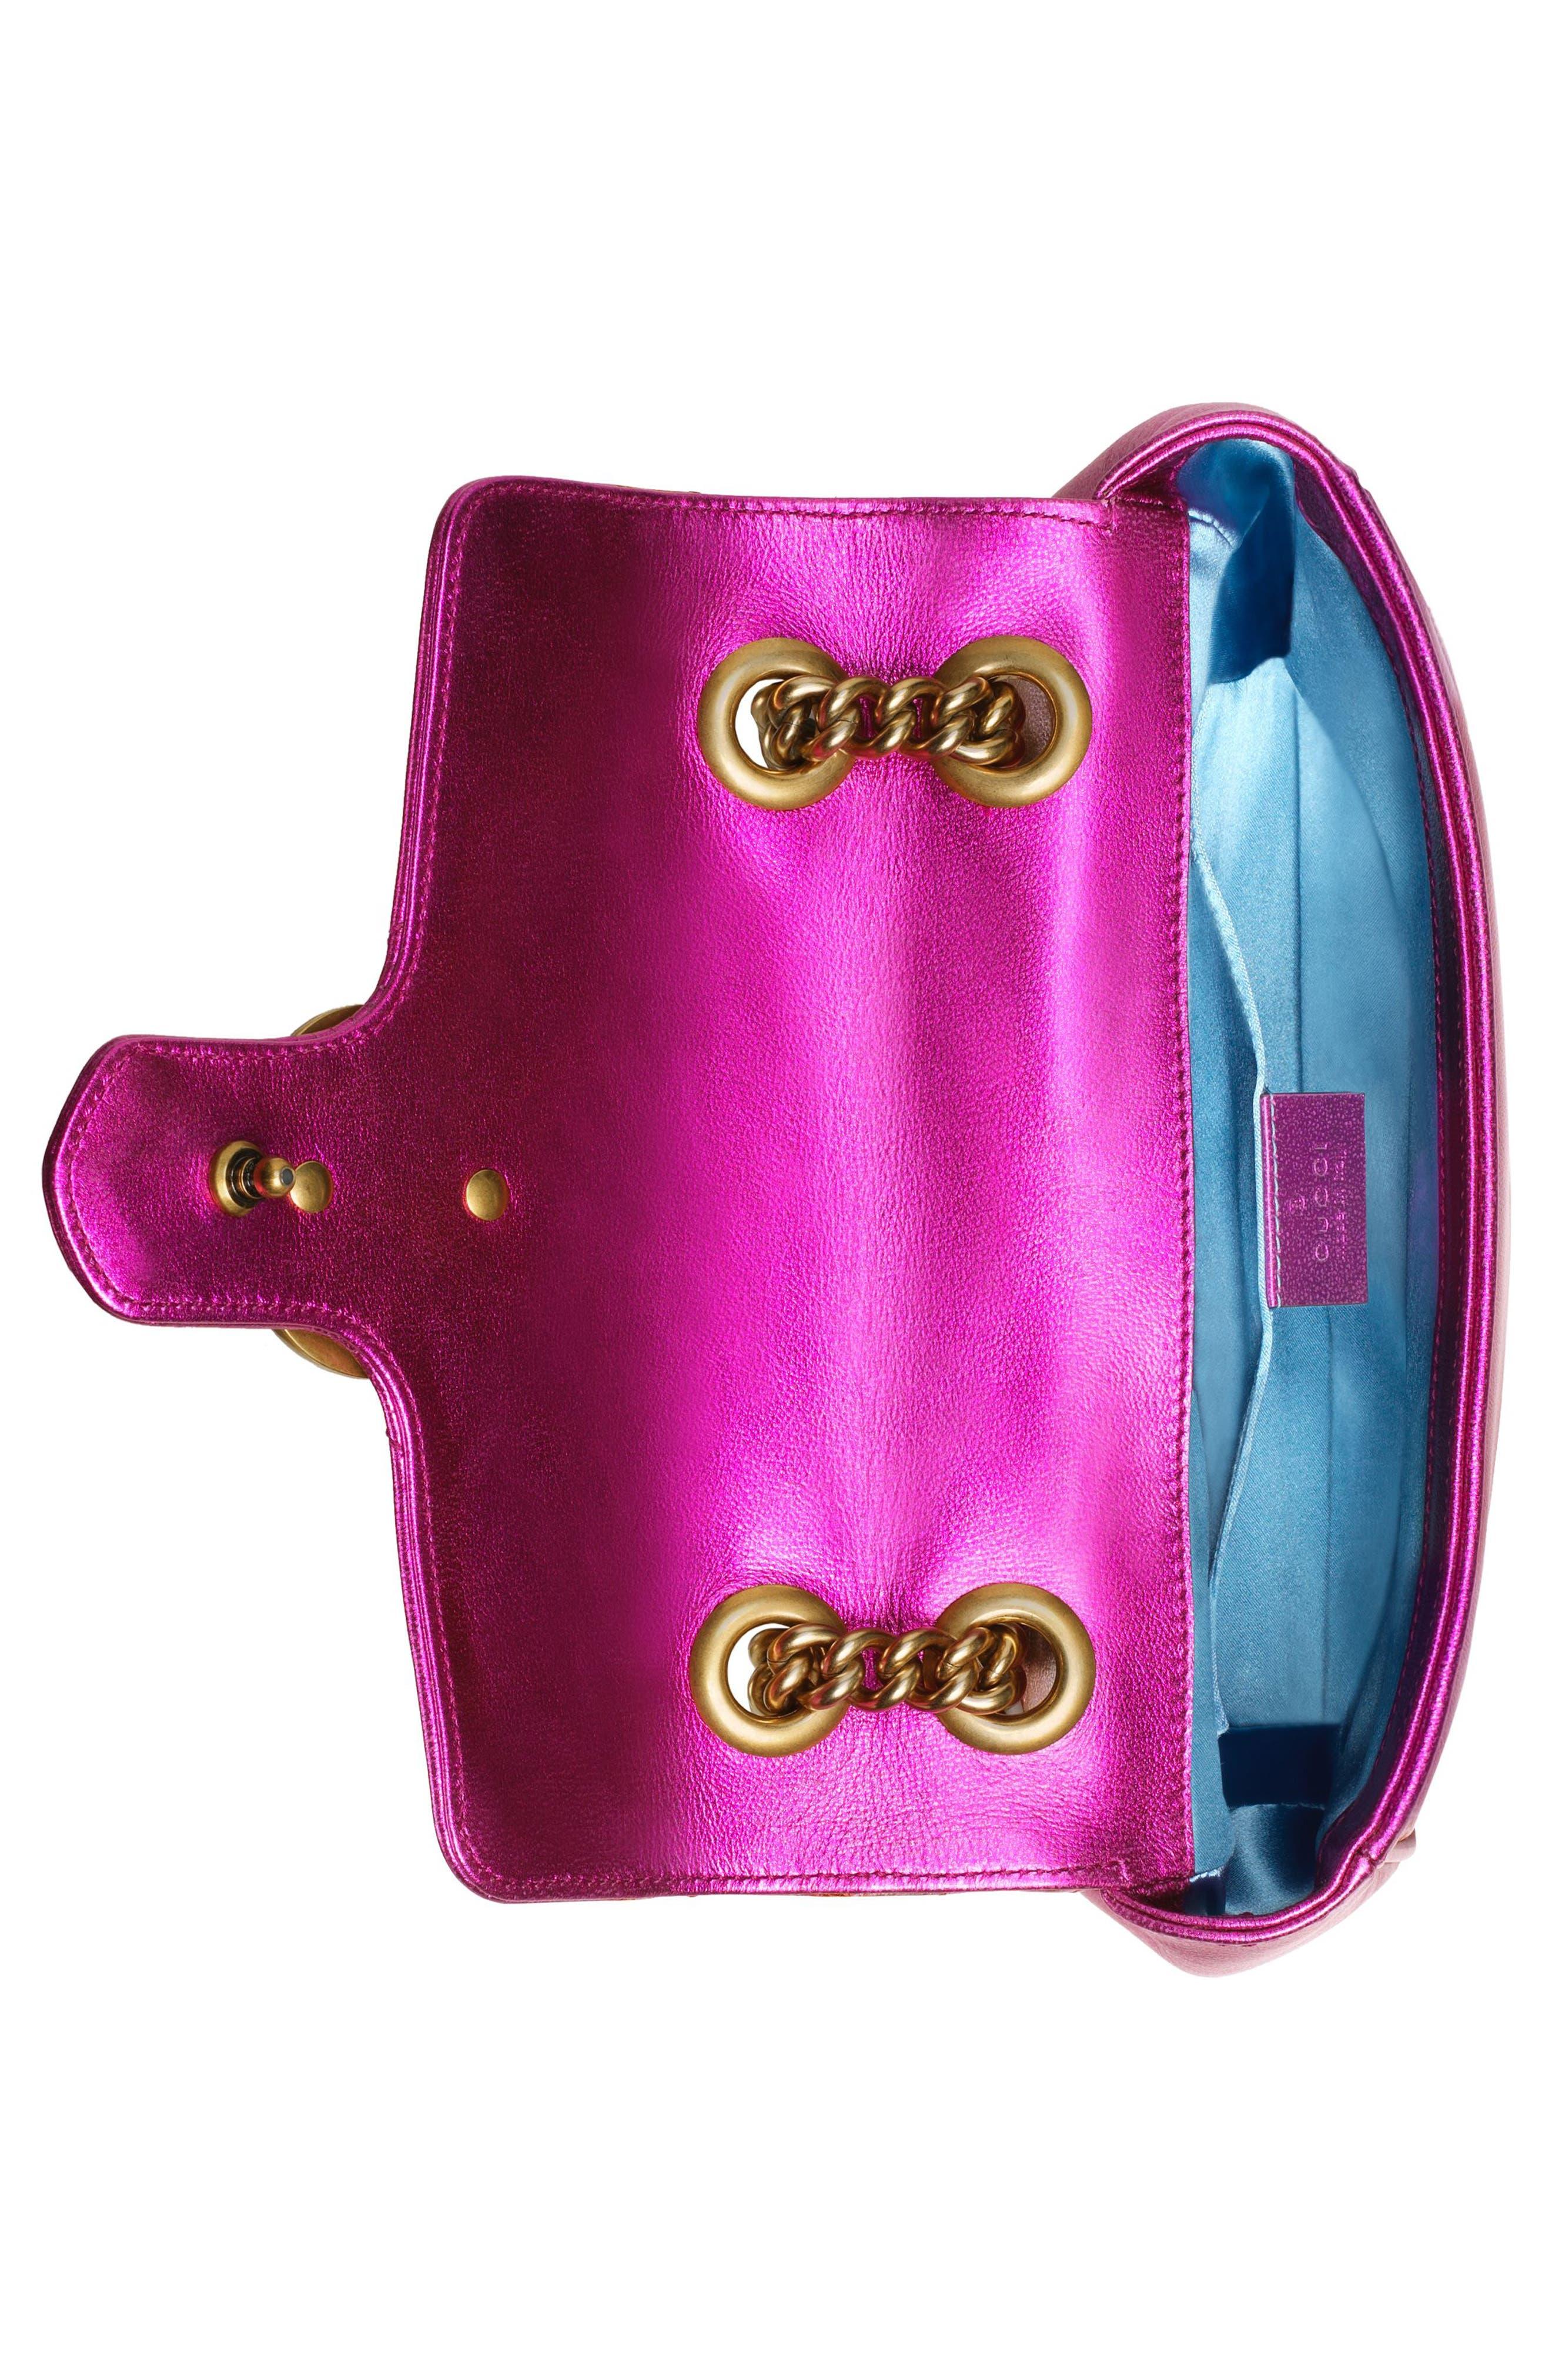 Mini Marmont 2.0 Metallic Leather Shoulder Bag,                             Alternate thumbnail 3, color,                             FUXIA/ ROSSO/ ROSA